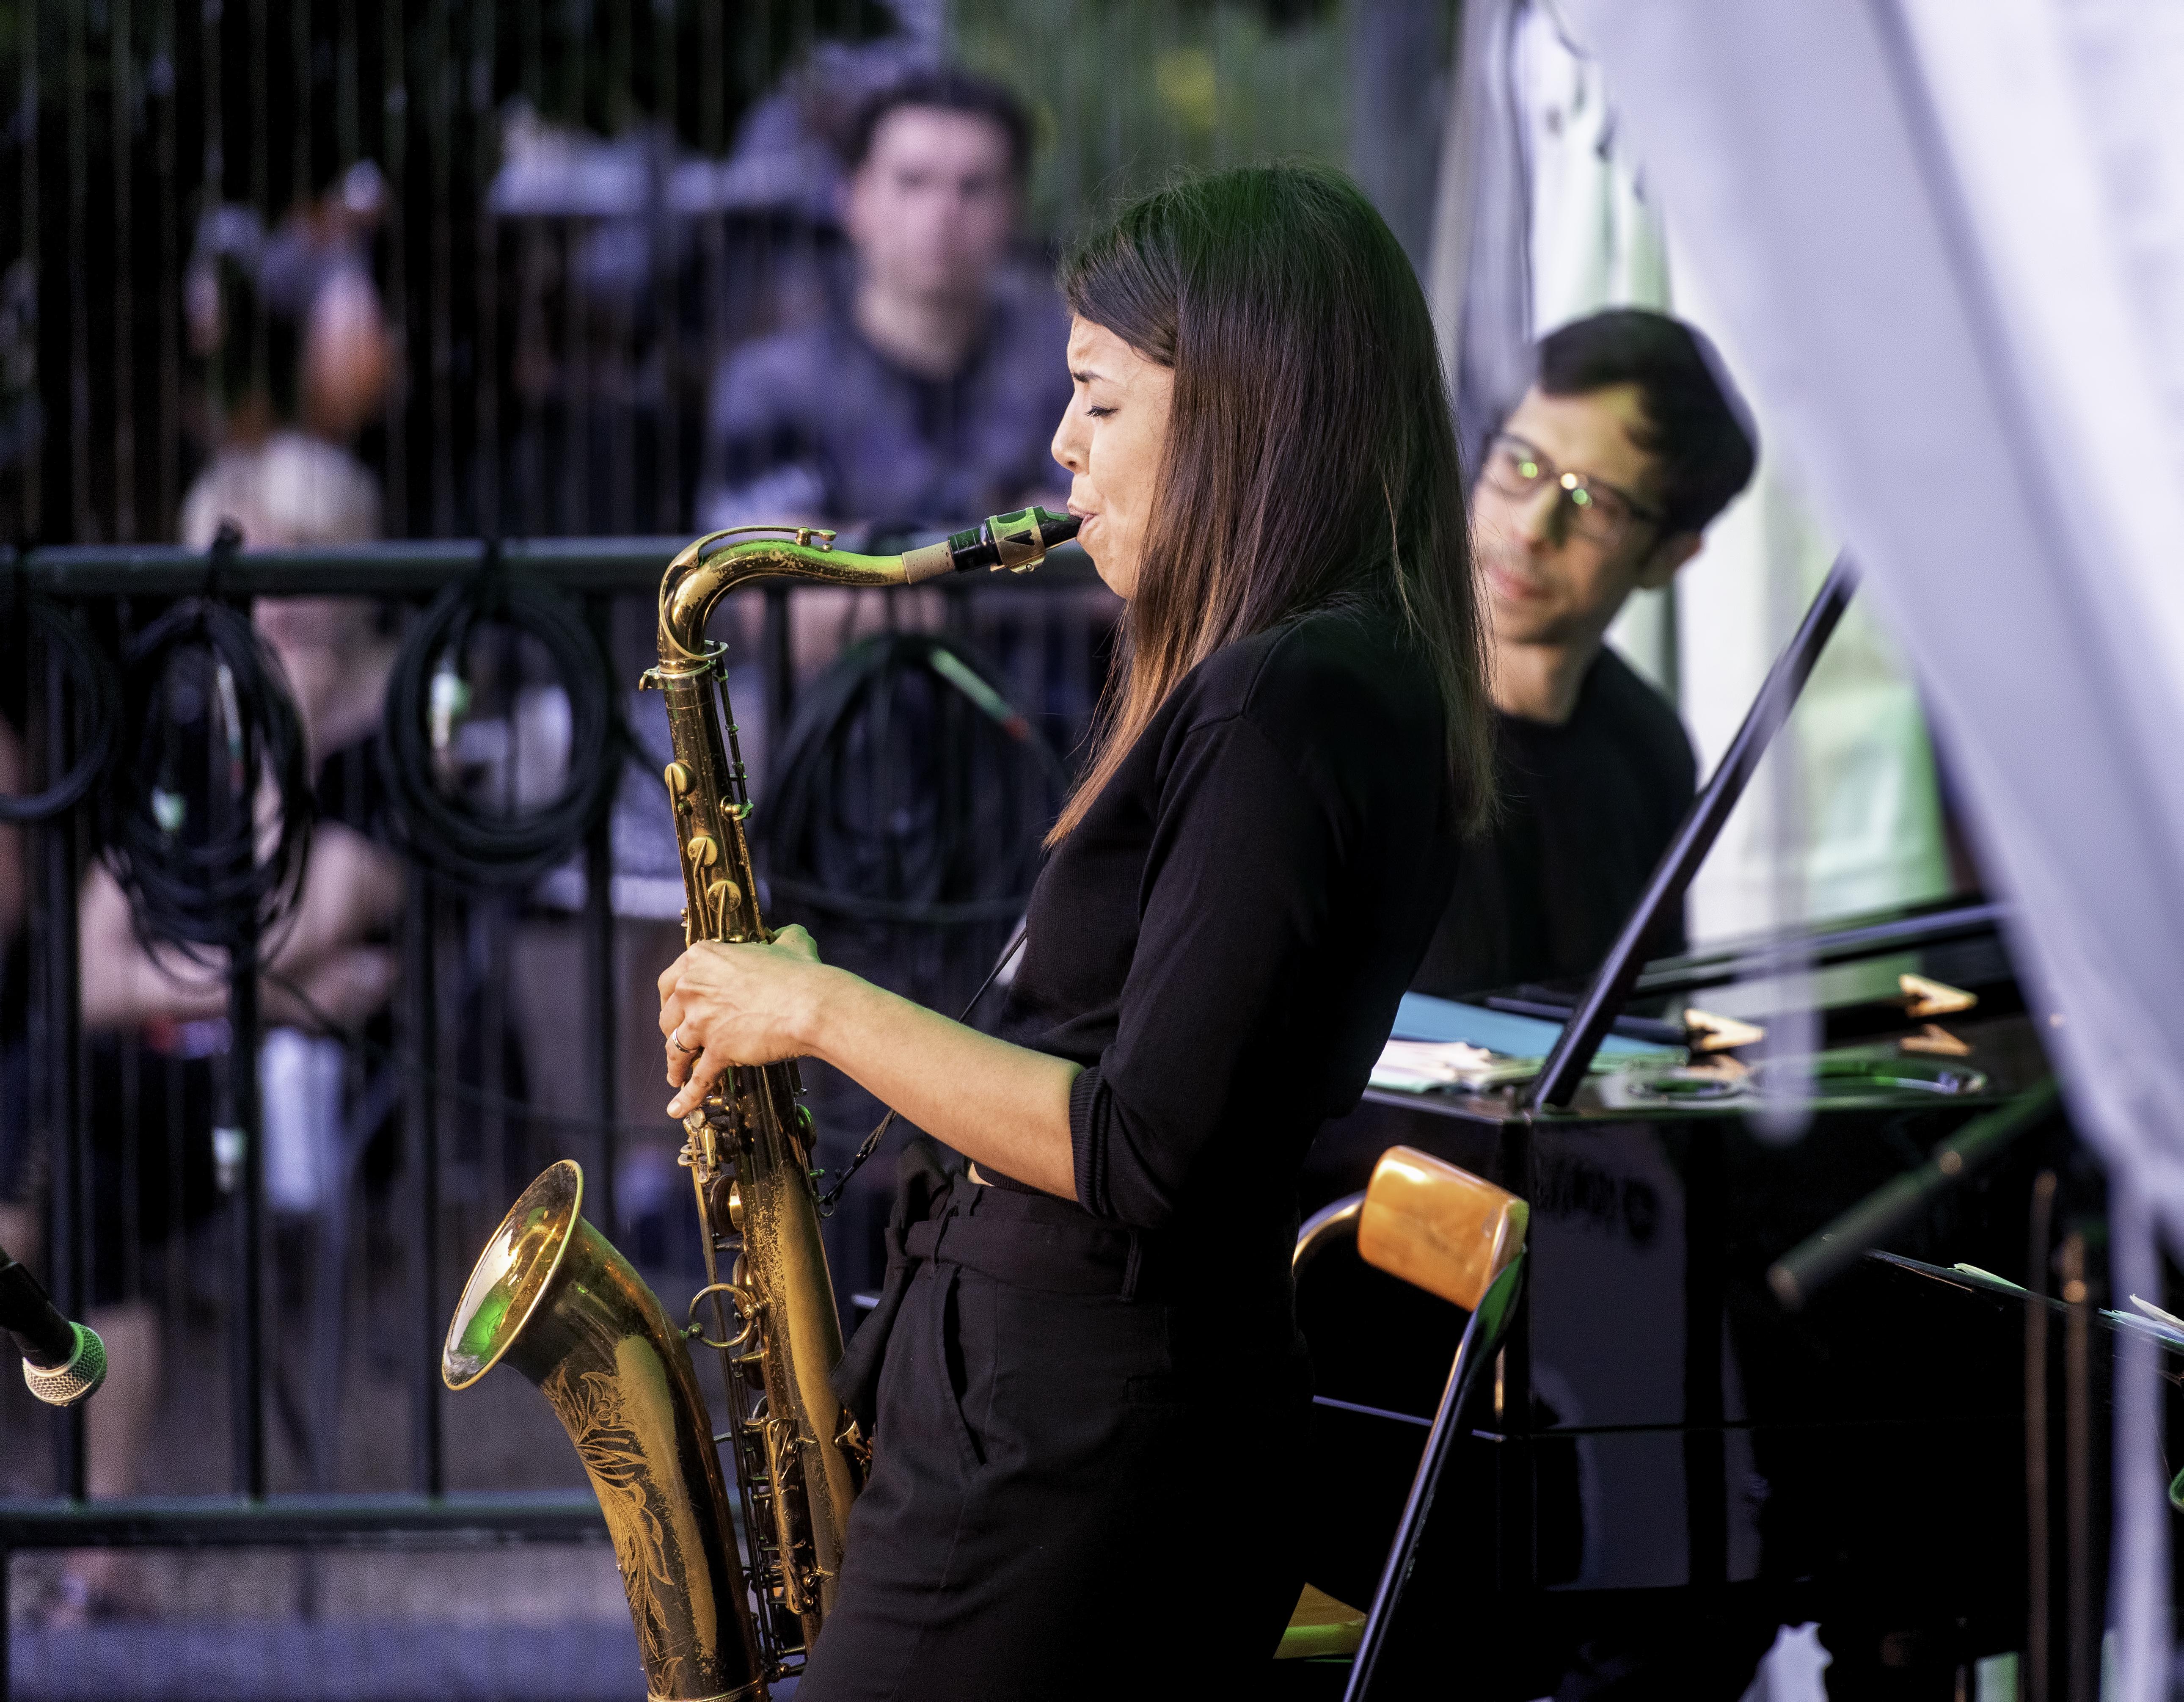 Melissa Aldana and Sam Harris at the Toronto Jazz Festival 2019